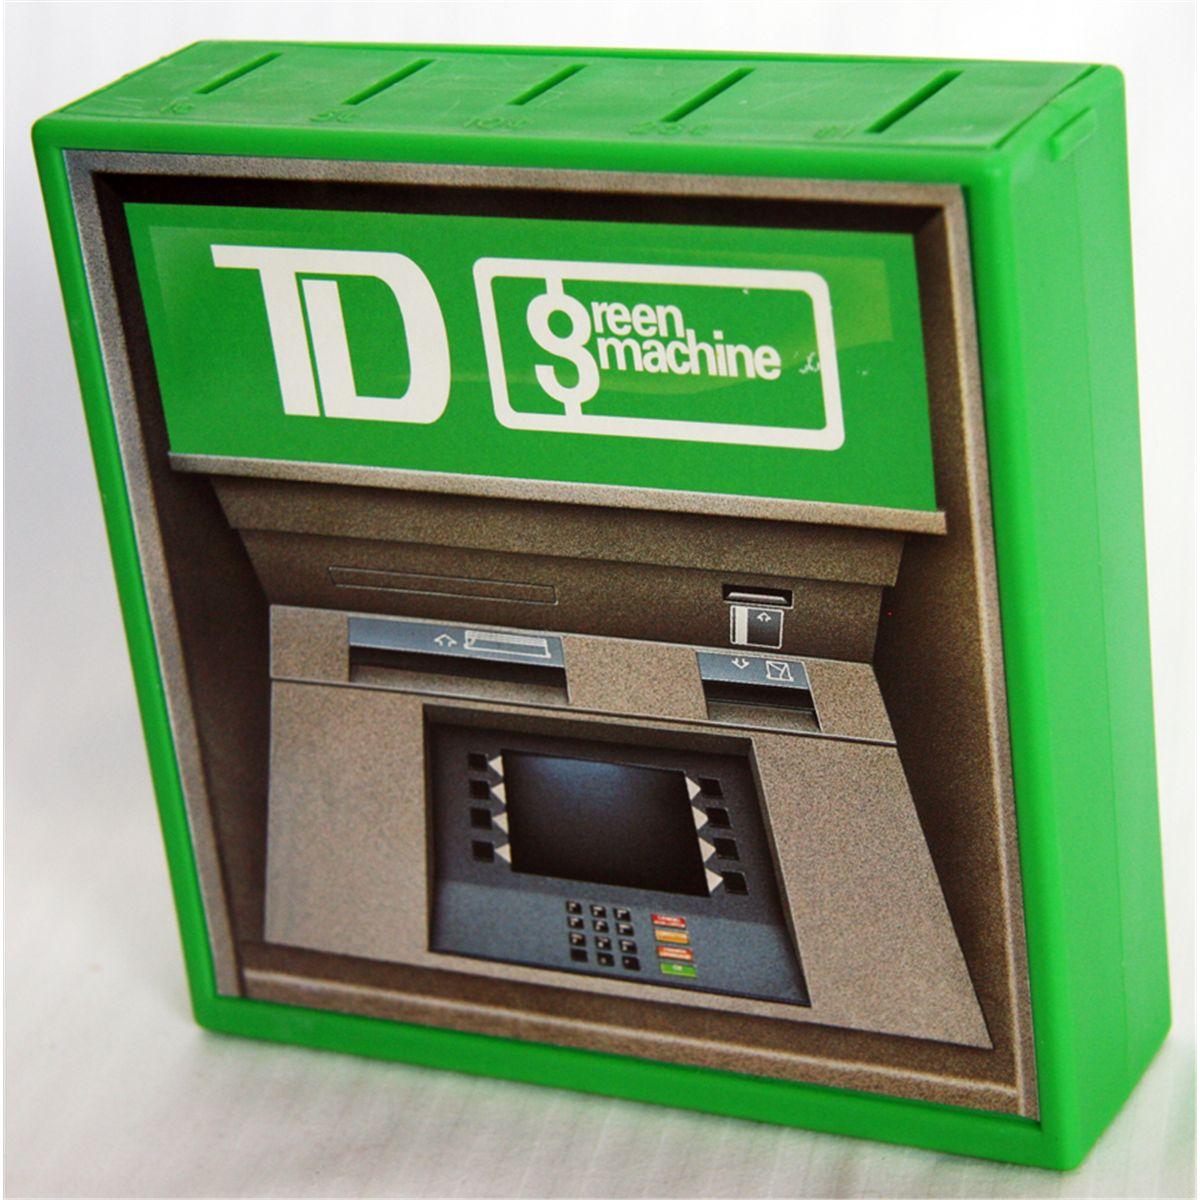 T D  BANK  Green Machine  A rectangular green plastic bank in the shape of  the T D green machine  Fi